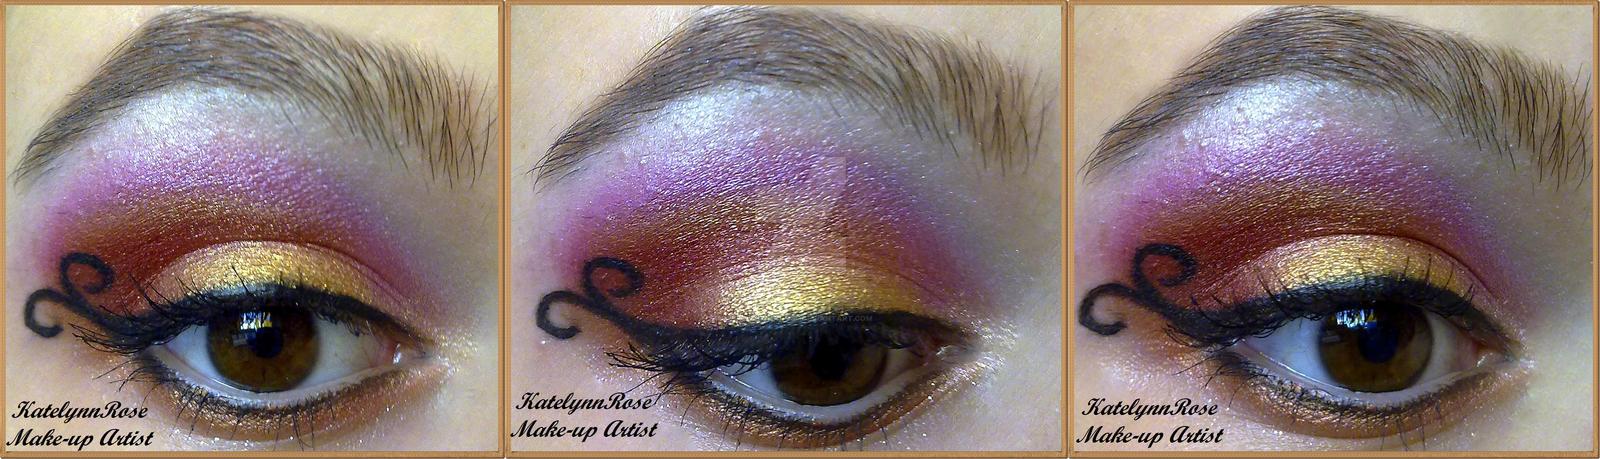 Aries make-up inspired by KatelynnRose